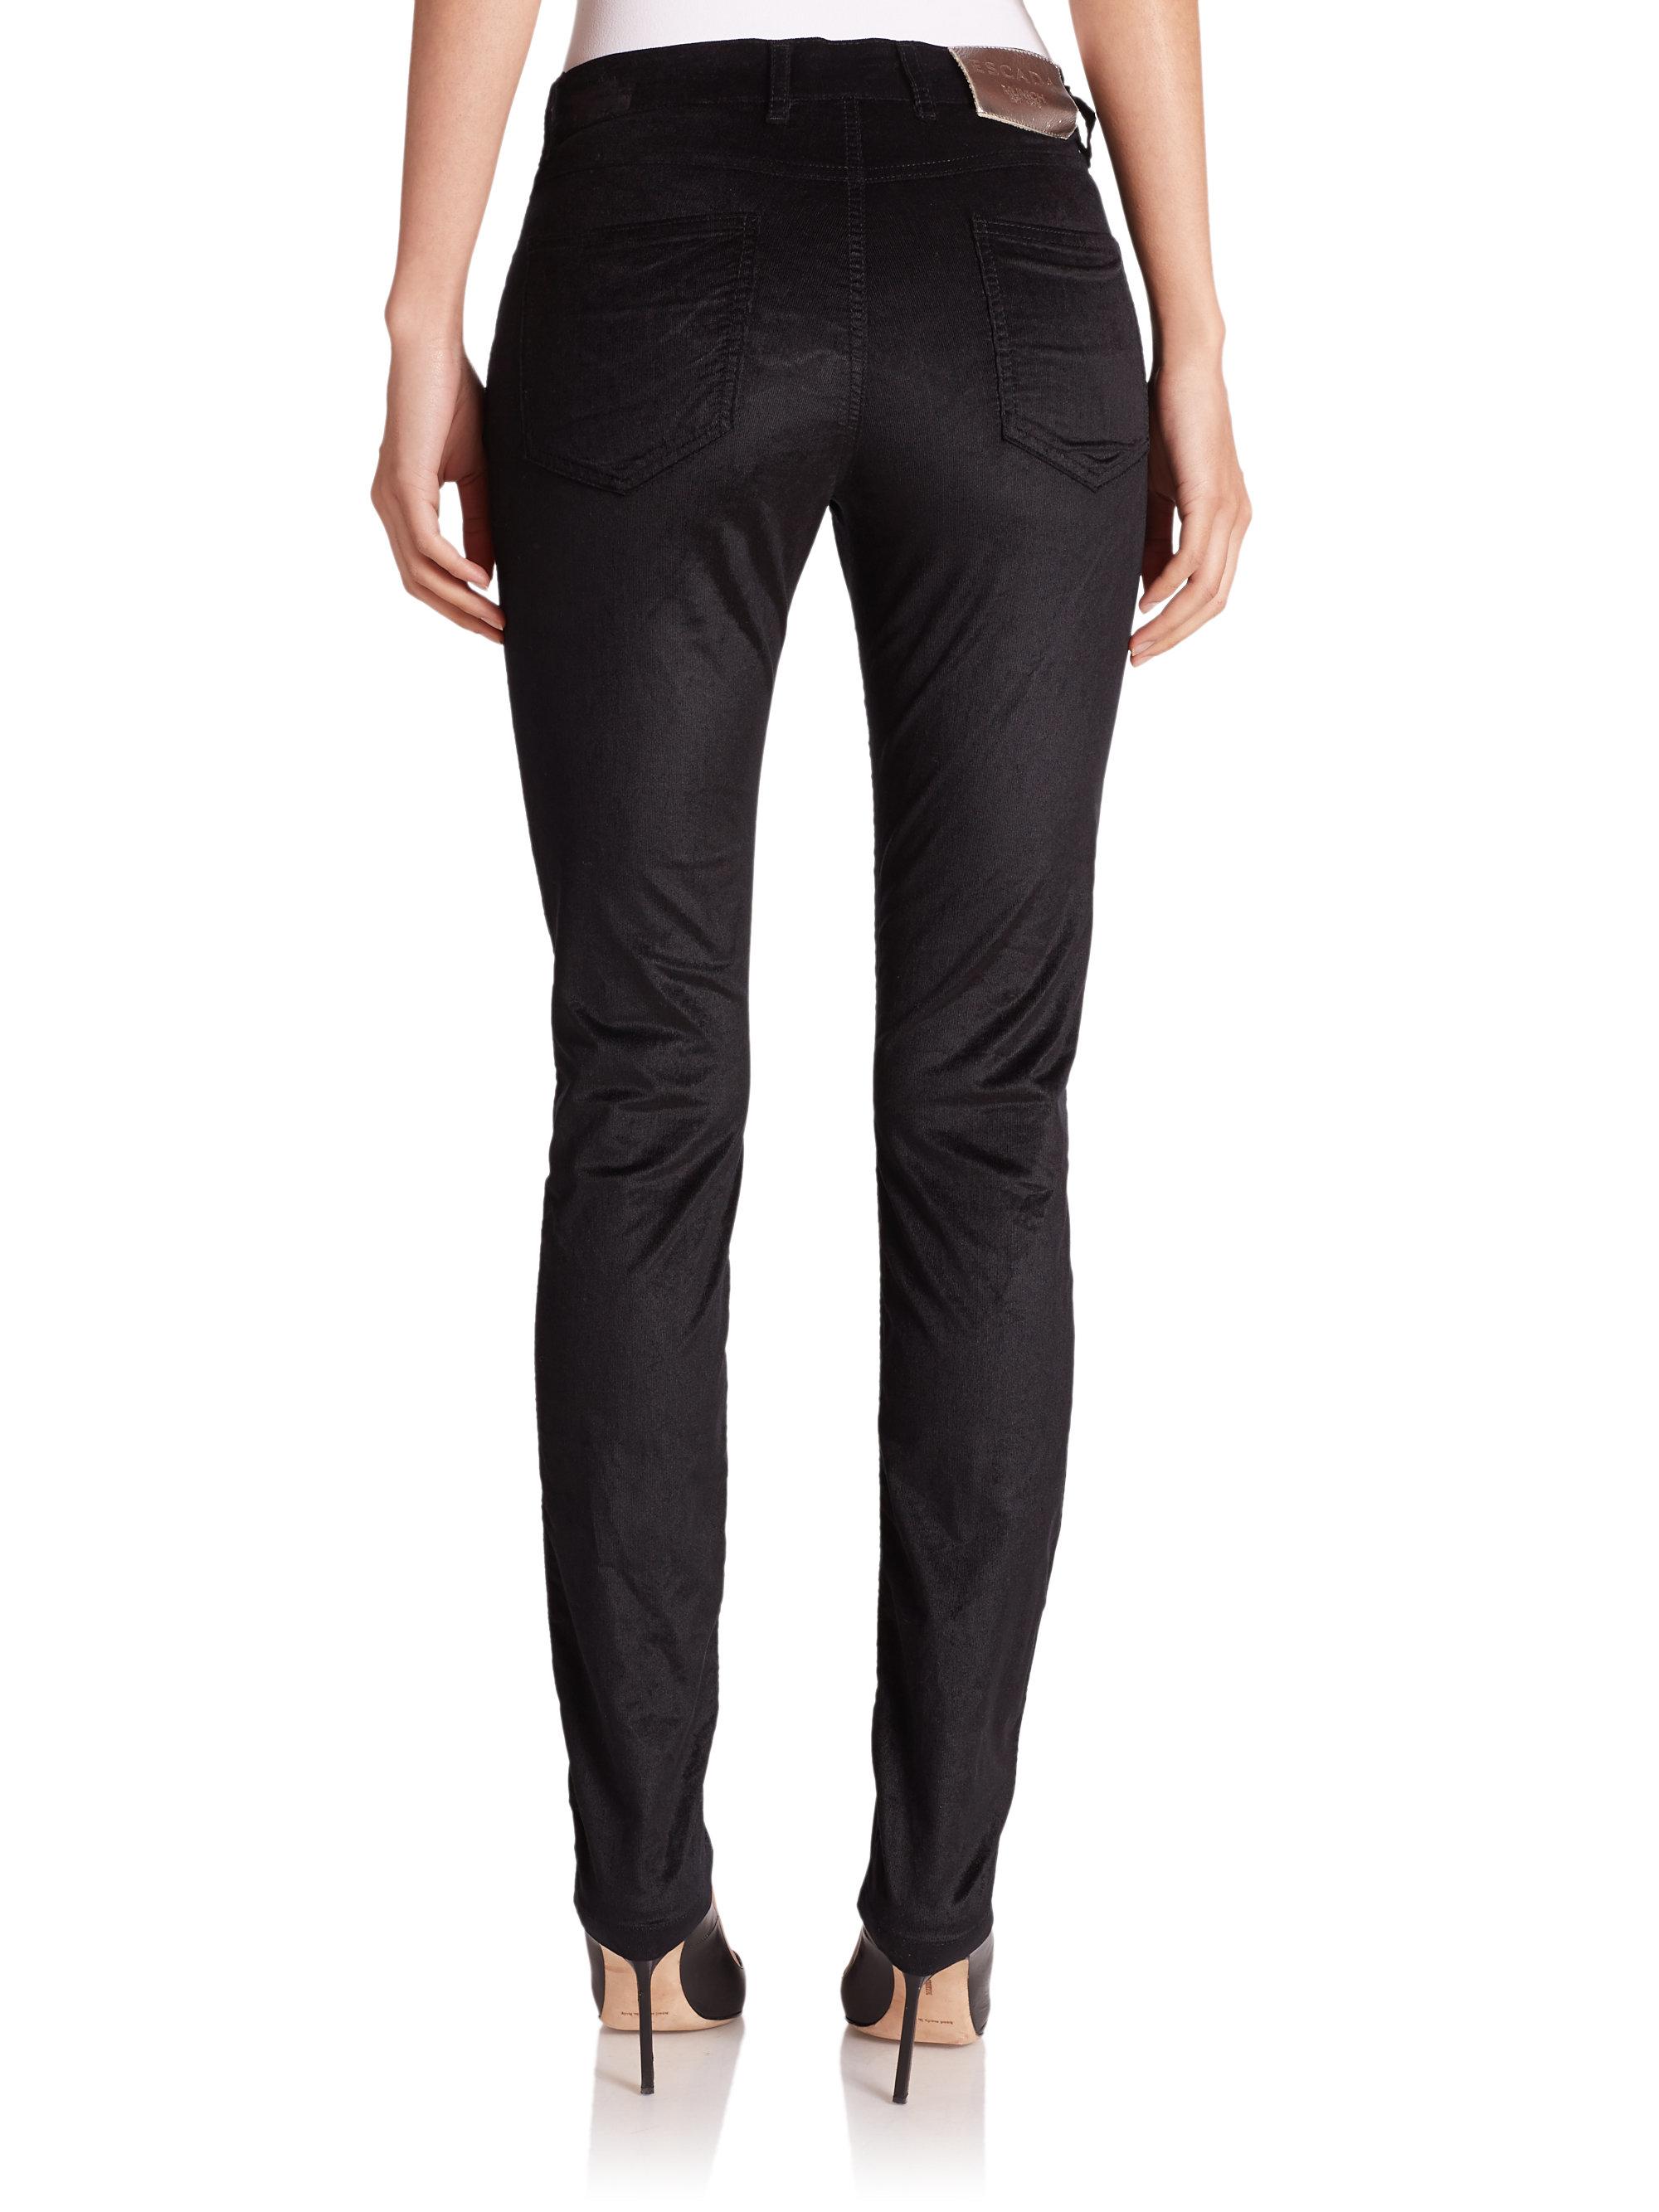 Lyst - Escada Velvet Corduroy Jeans in Black